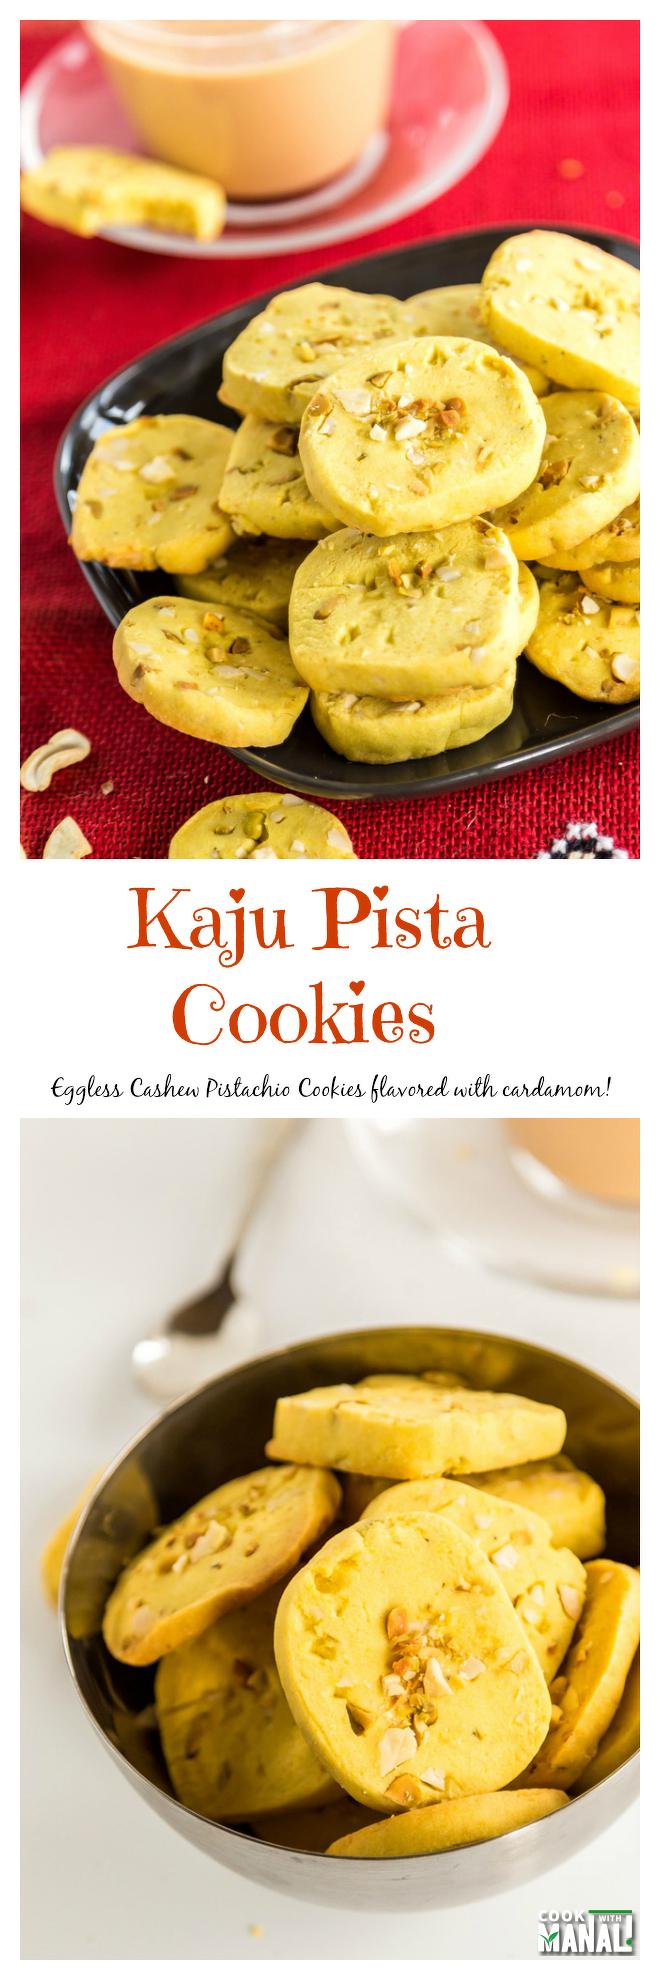 Eggless Kaju Pista Cookies Collage